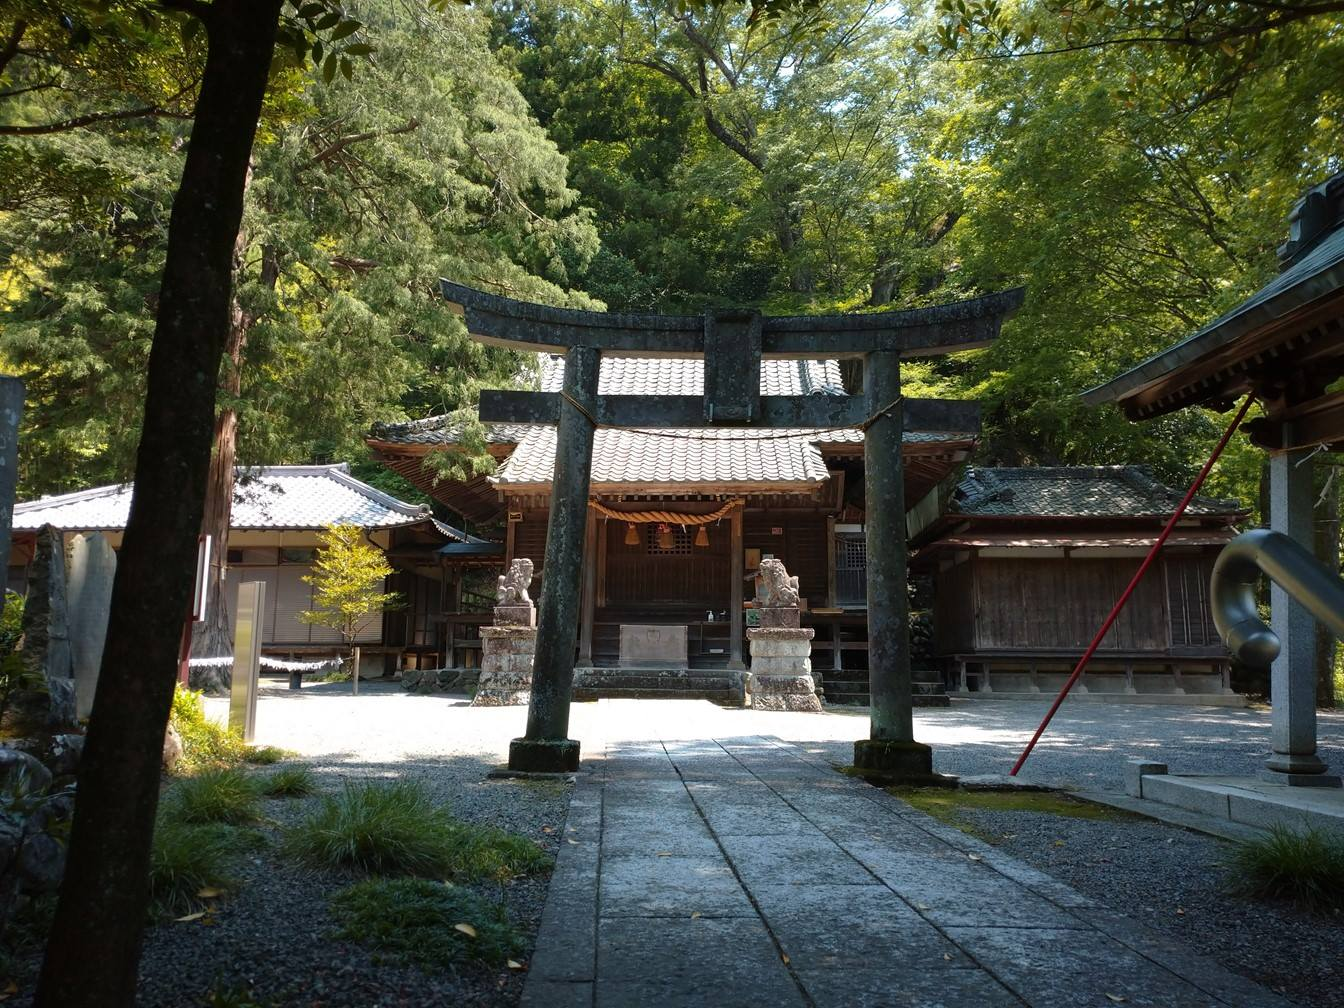 白瀧神社の社殿